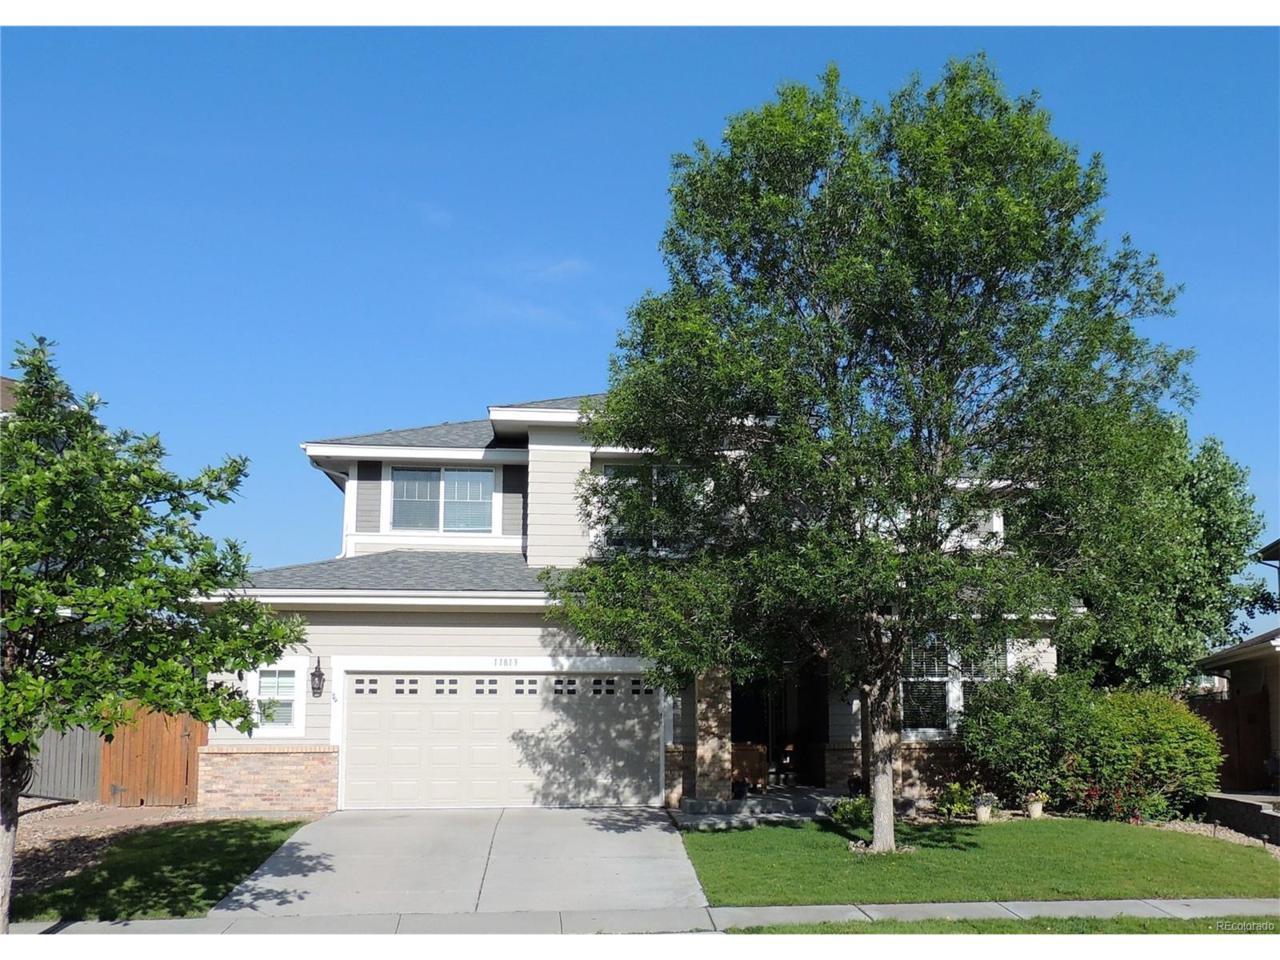 11813 Memphis Street, Commerce City, CO 80022 (MLS #7856490) :: 8z Real Estate